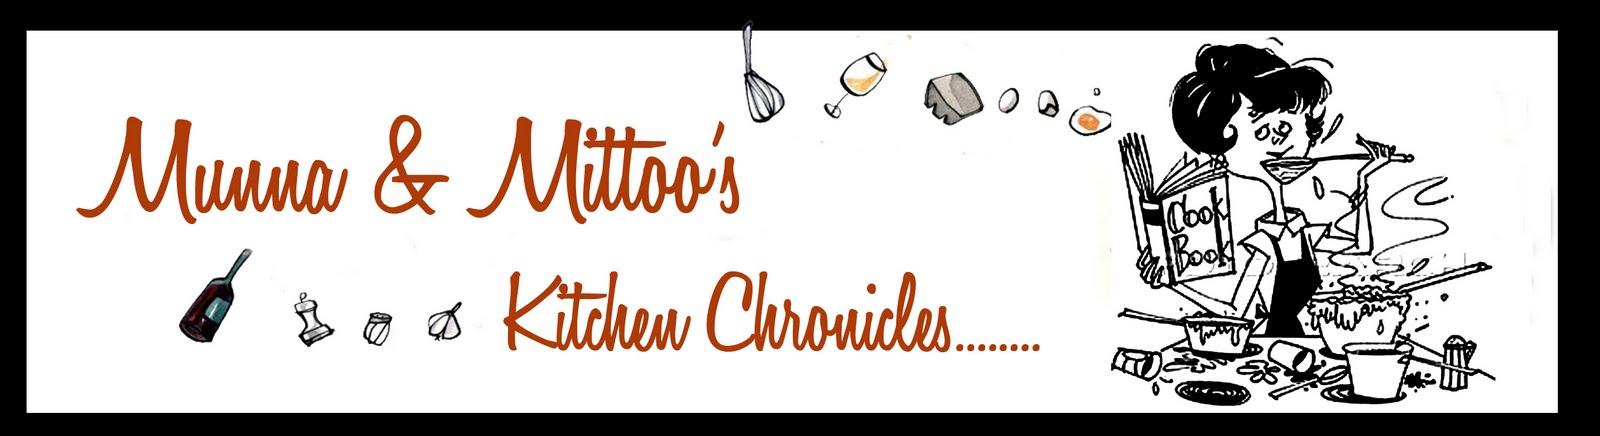 Munna & Mittoo's Kitchen Chronicles..